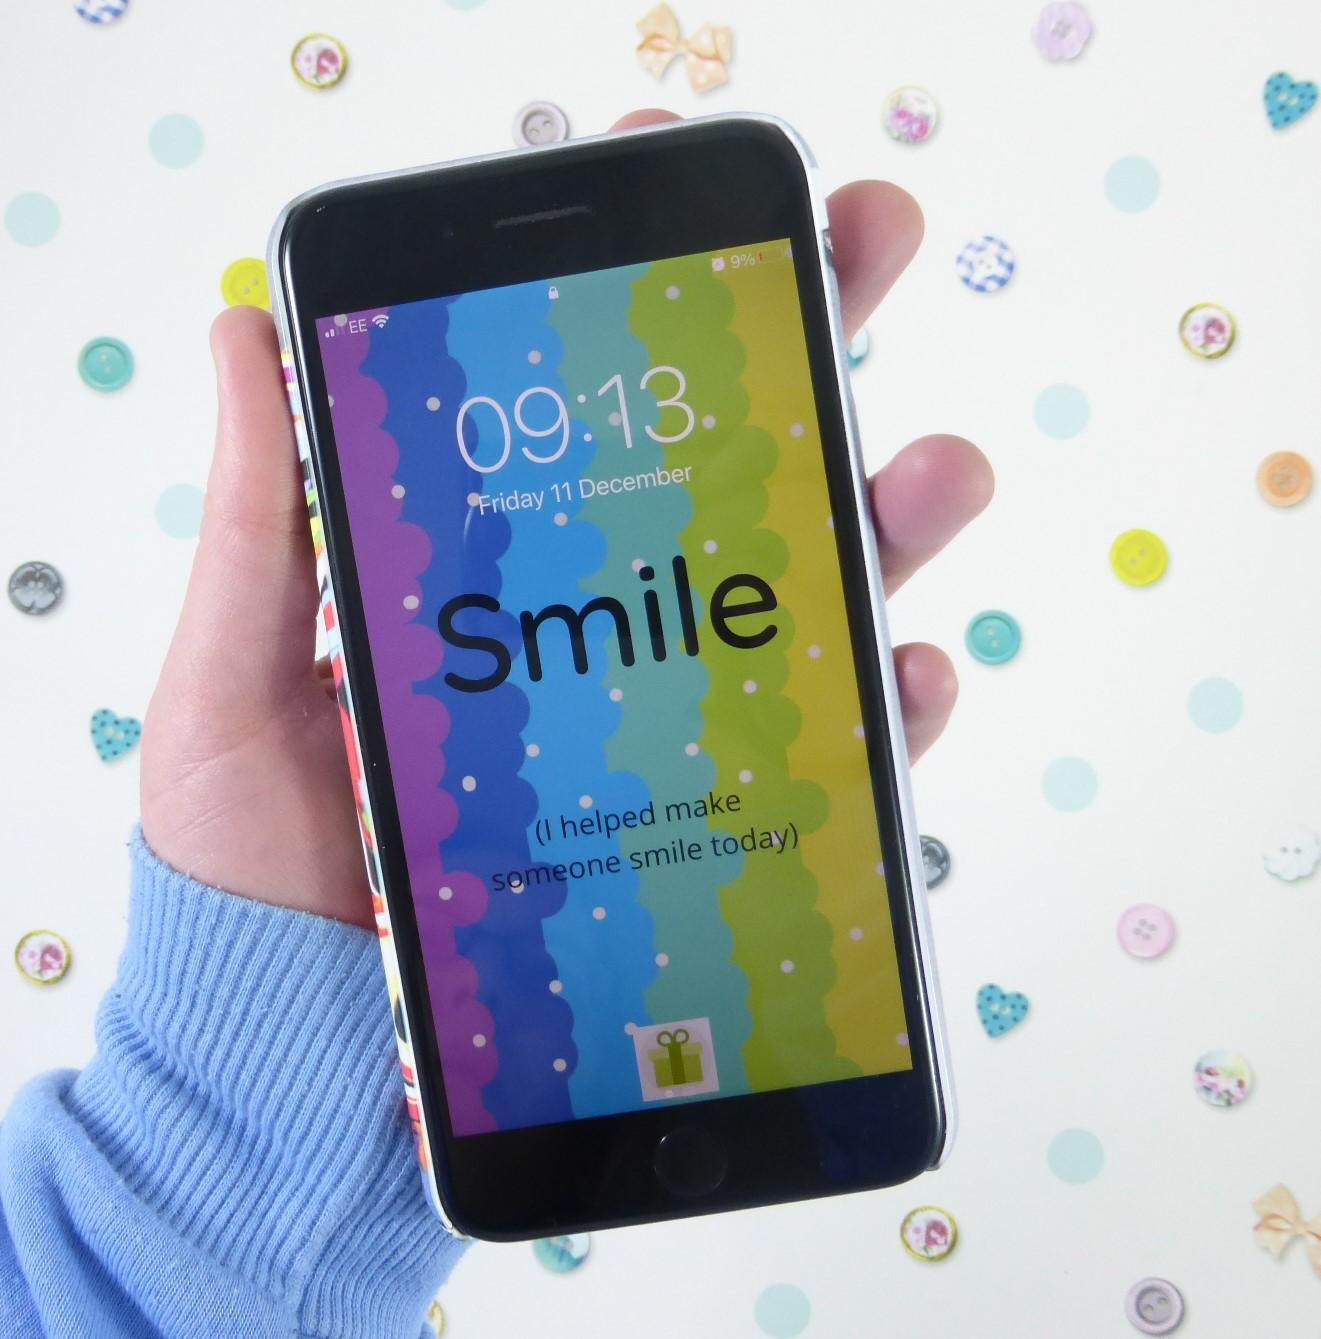 Smile Phone Wallpaper, Rainbow iPhone Background, The Smile Parcel Supporter, Rainbow Art, Smile Design Kind Shop 2